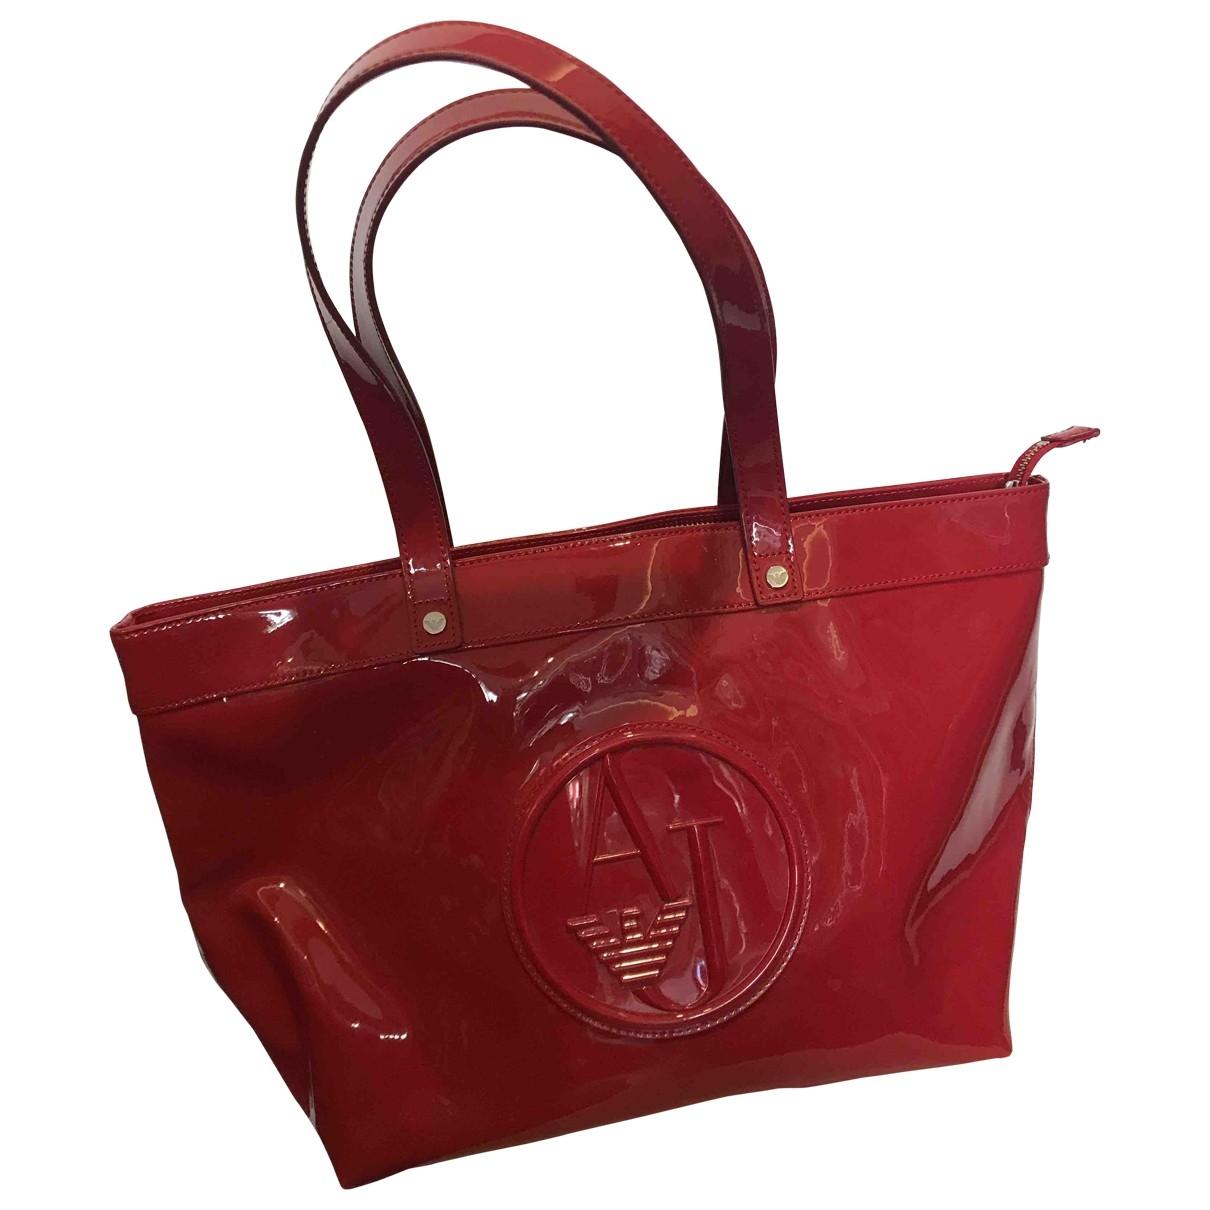 Armani Jeans \N Red handbag for Women \N